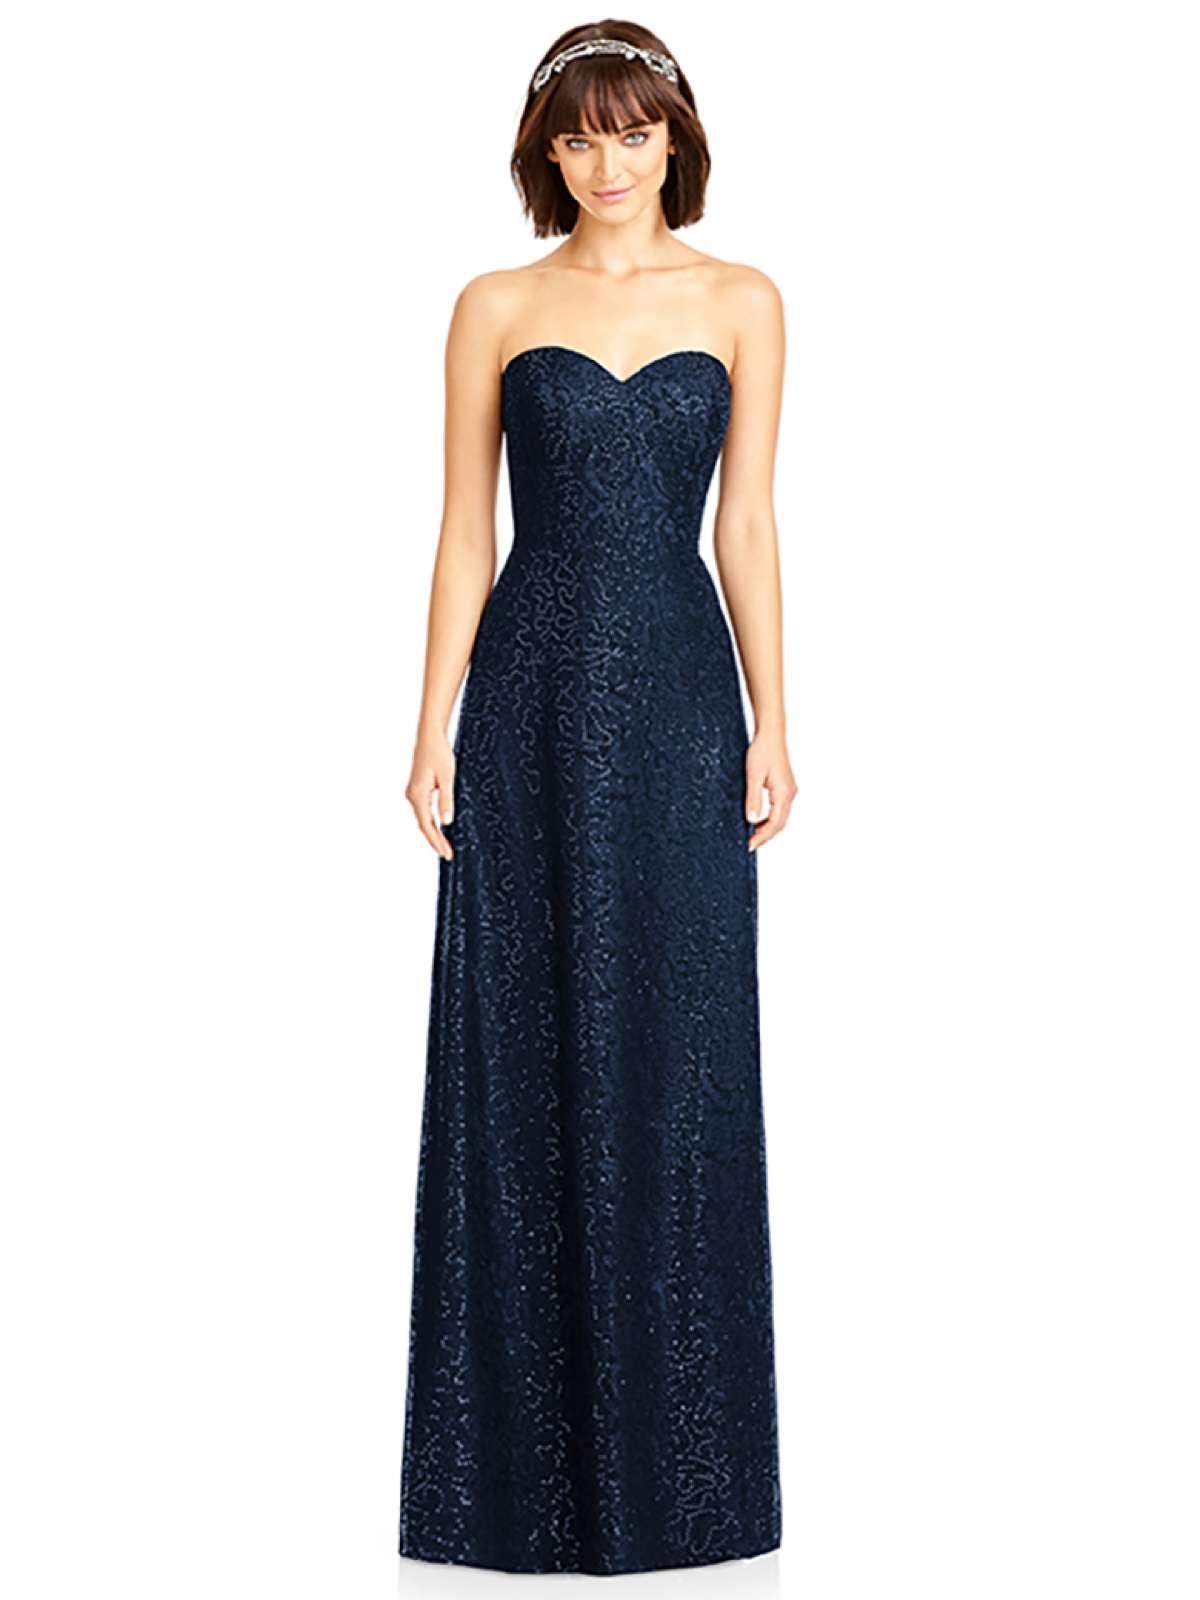 Harrogate Bridal Show Trends - Dessy